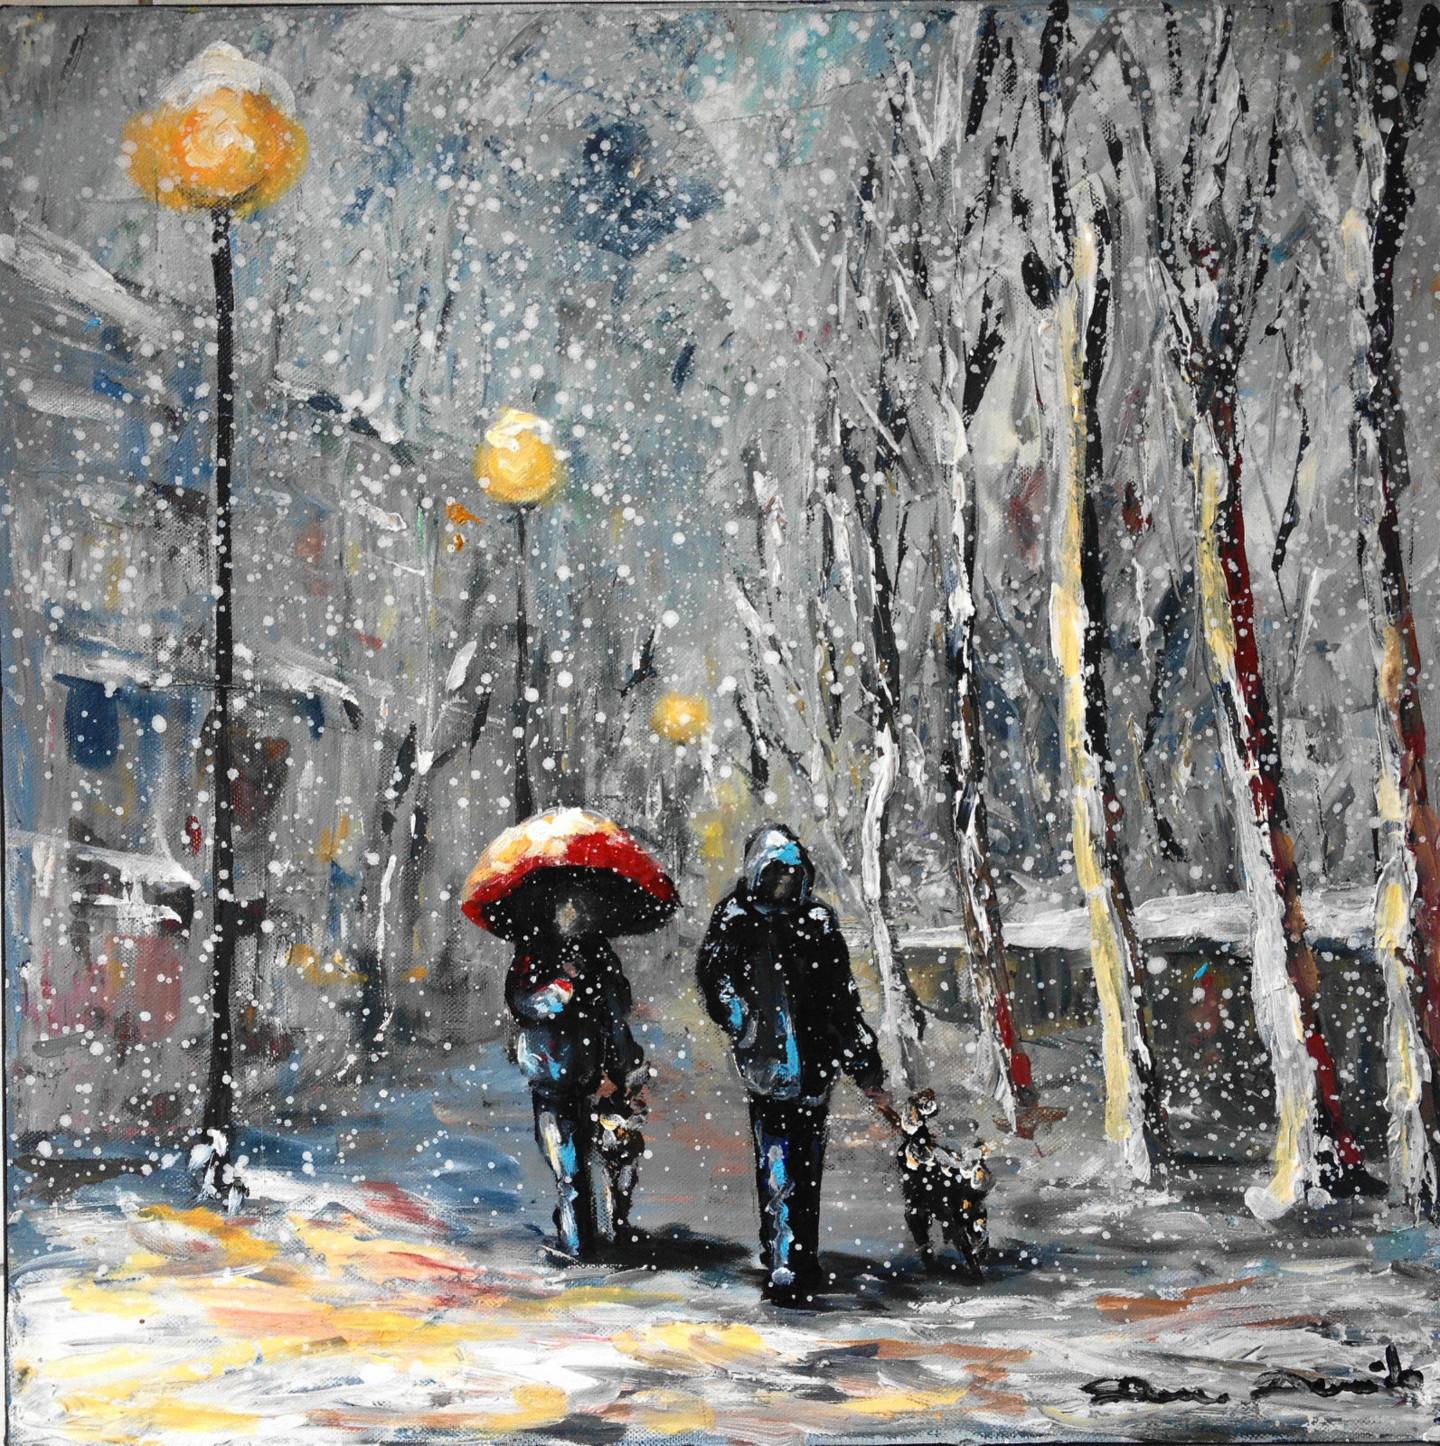 Dam Domido - Paris neige, dernière promenade...